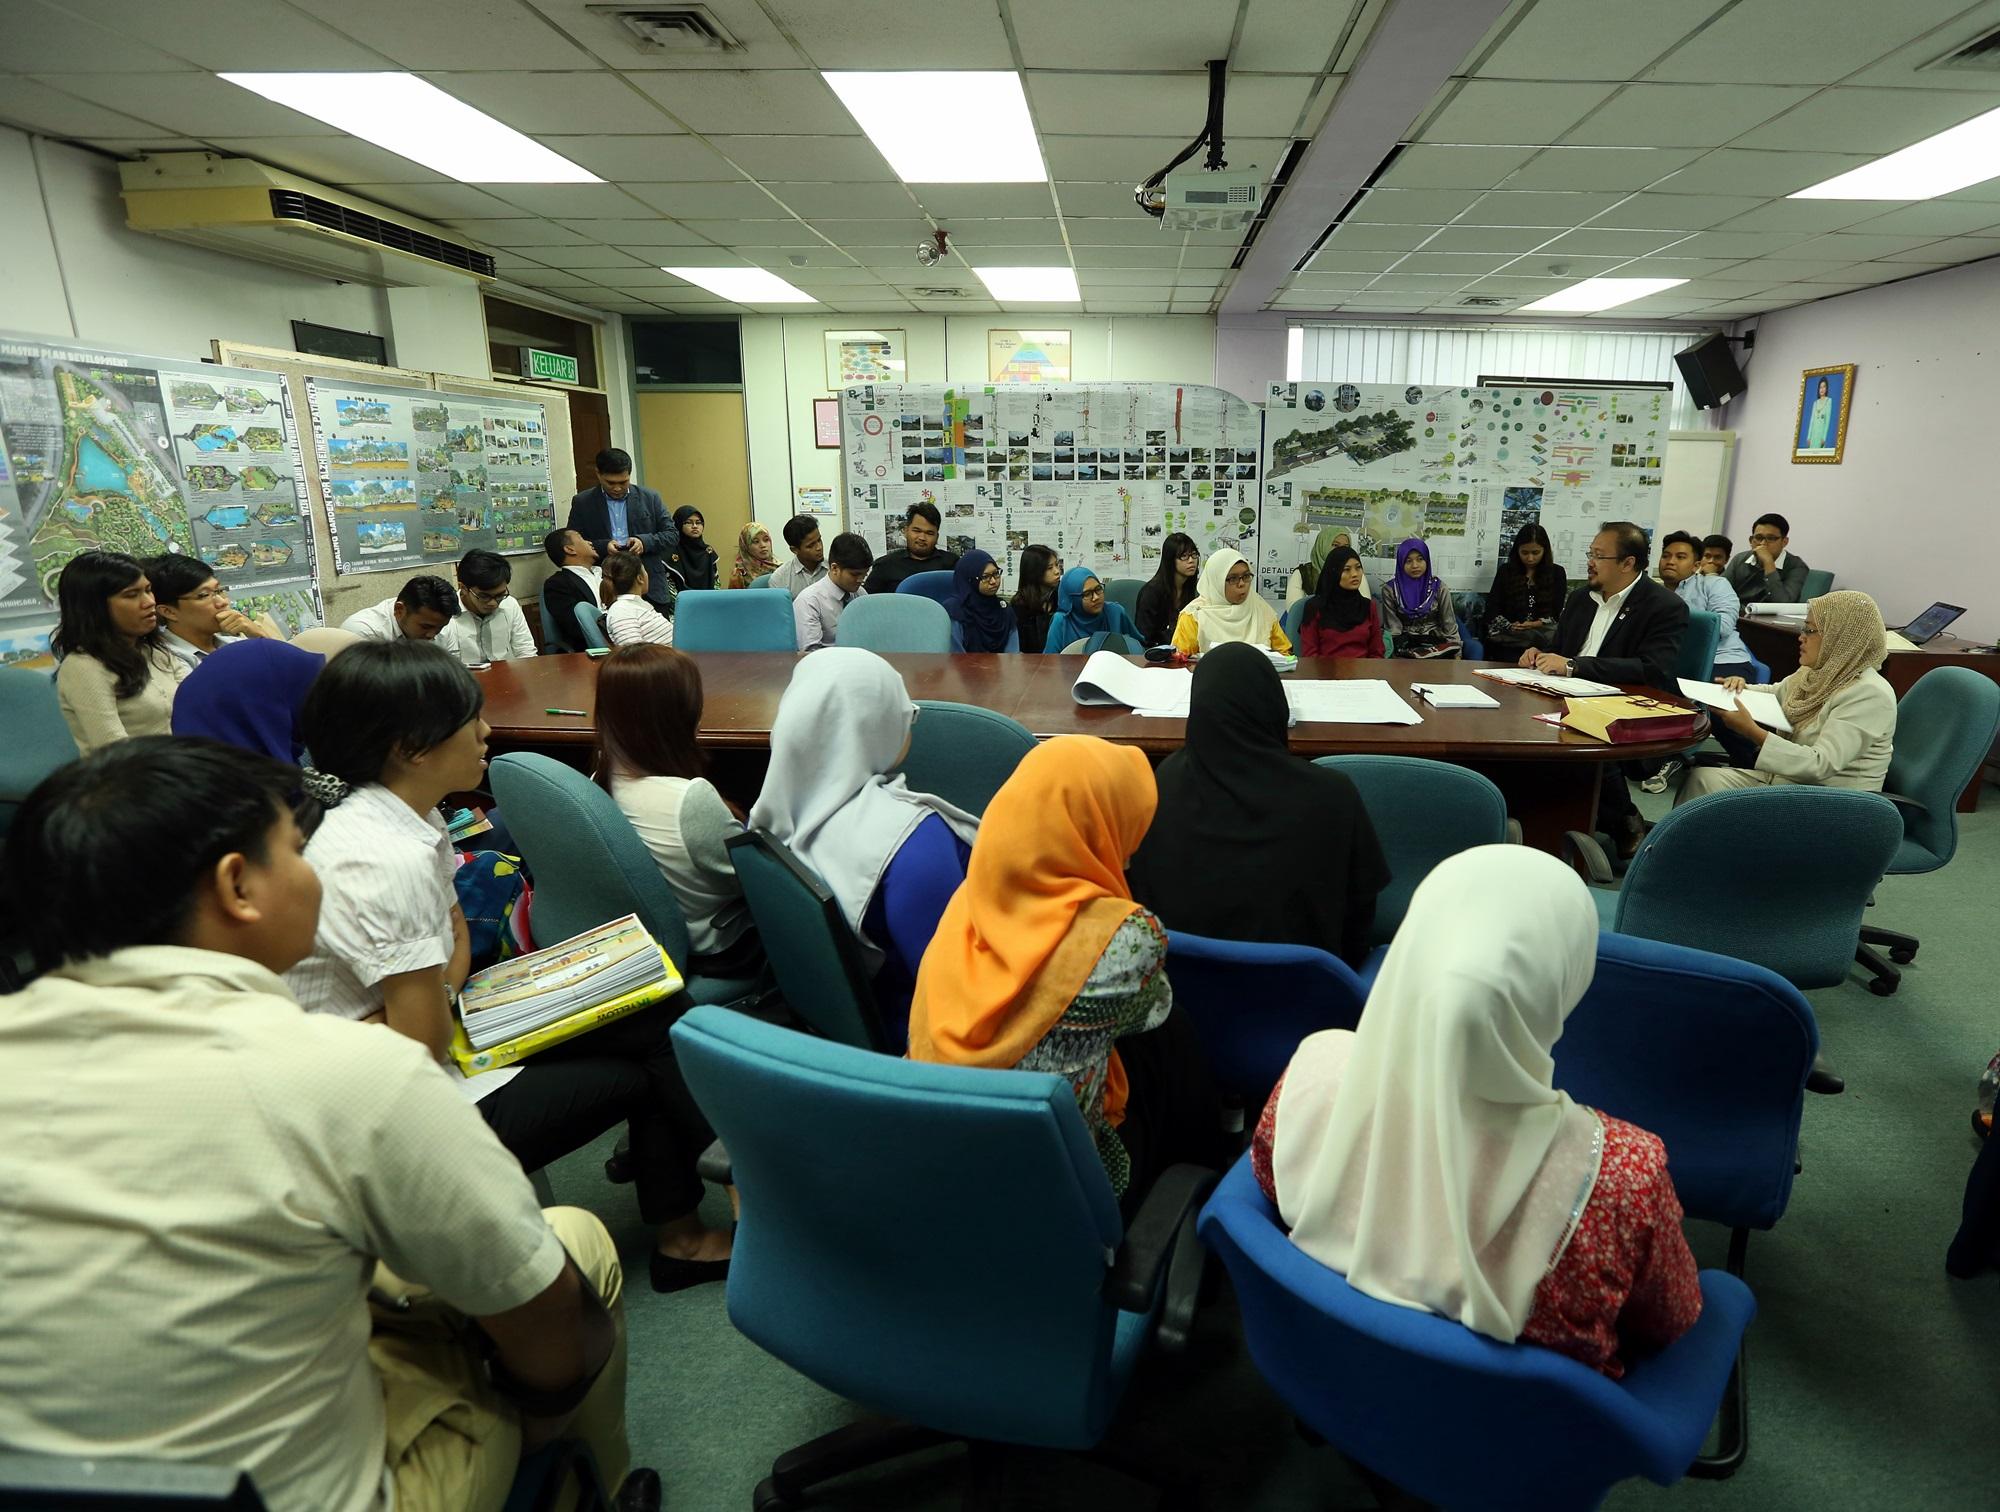 External Examiner Visit (Department of Landscape Architecture) – 25 June 2015